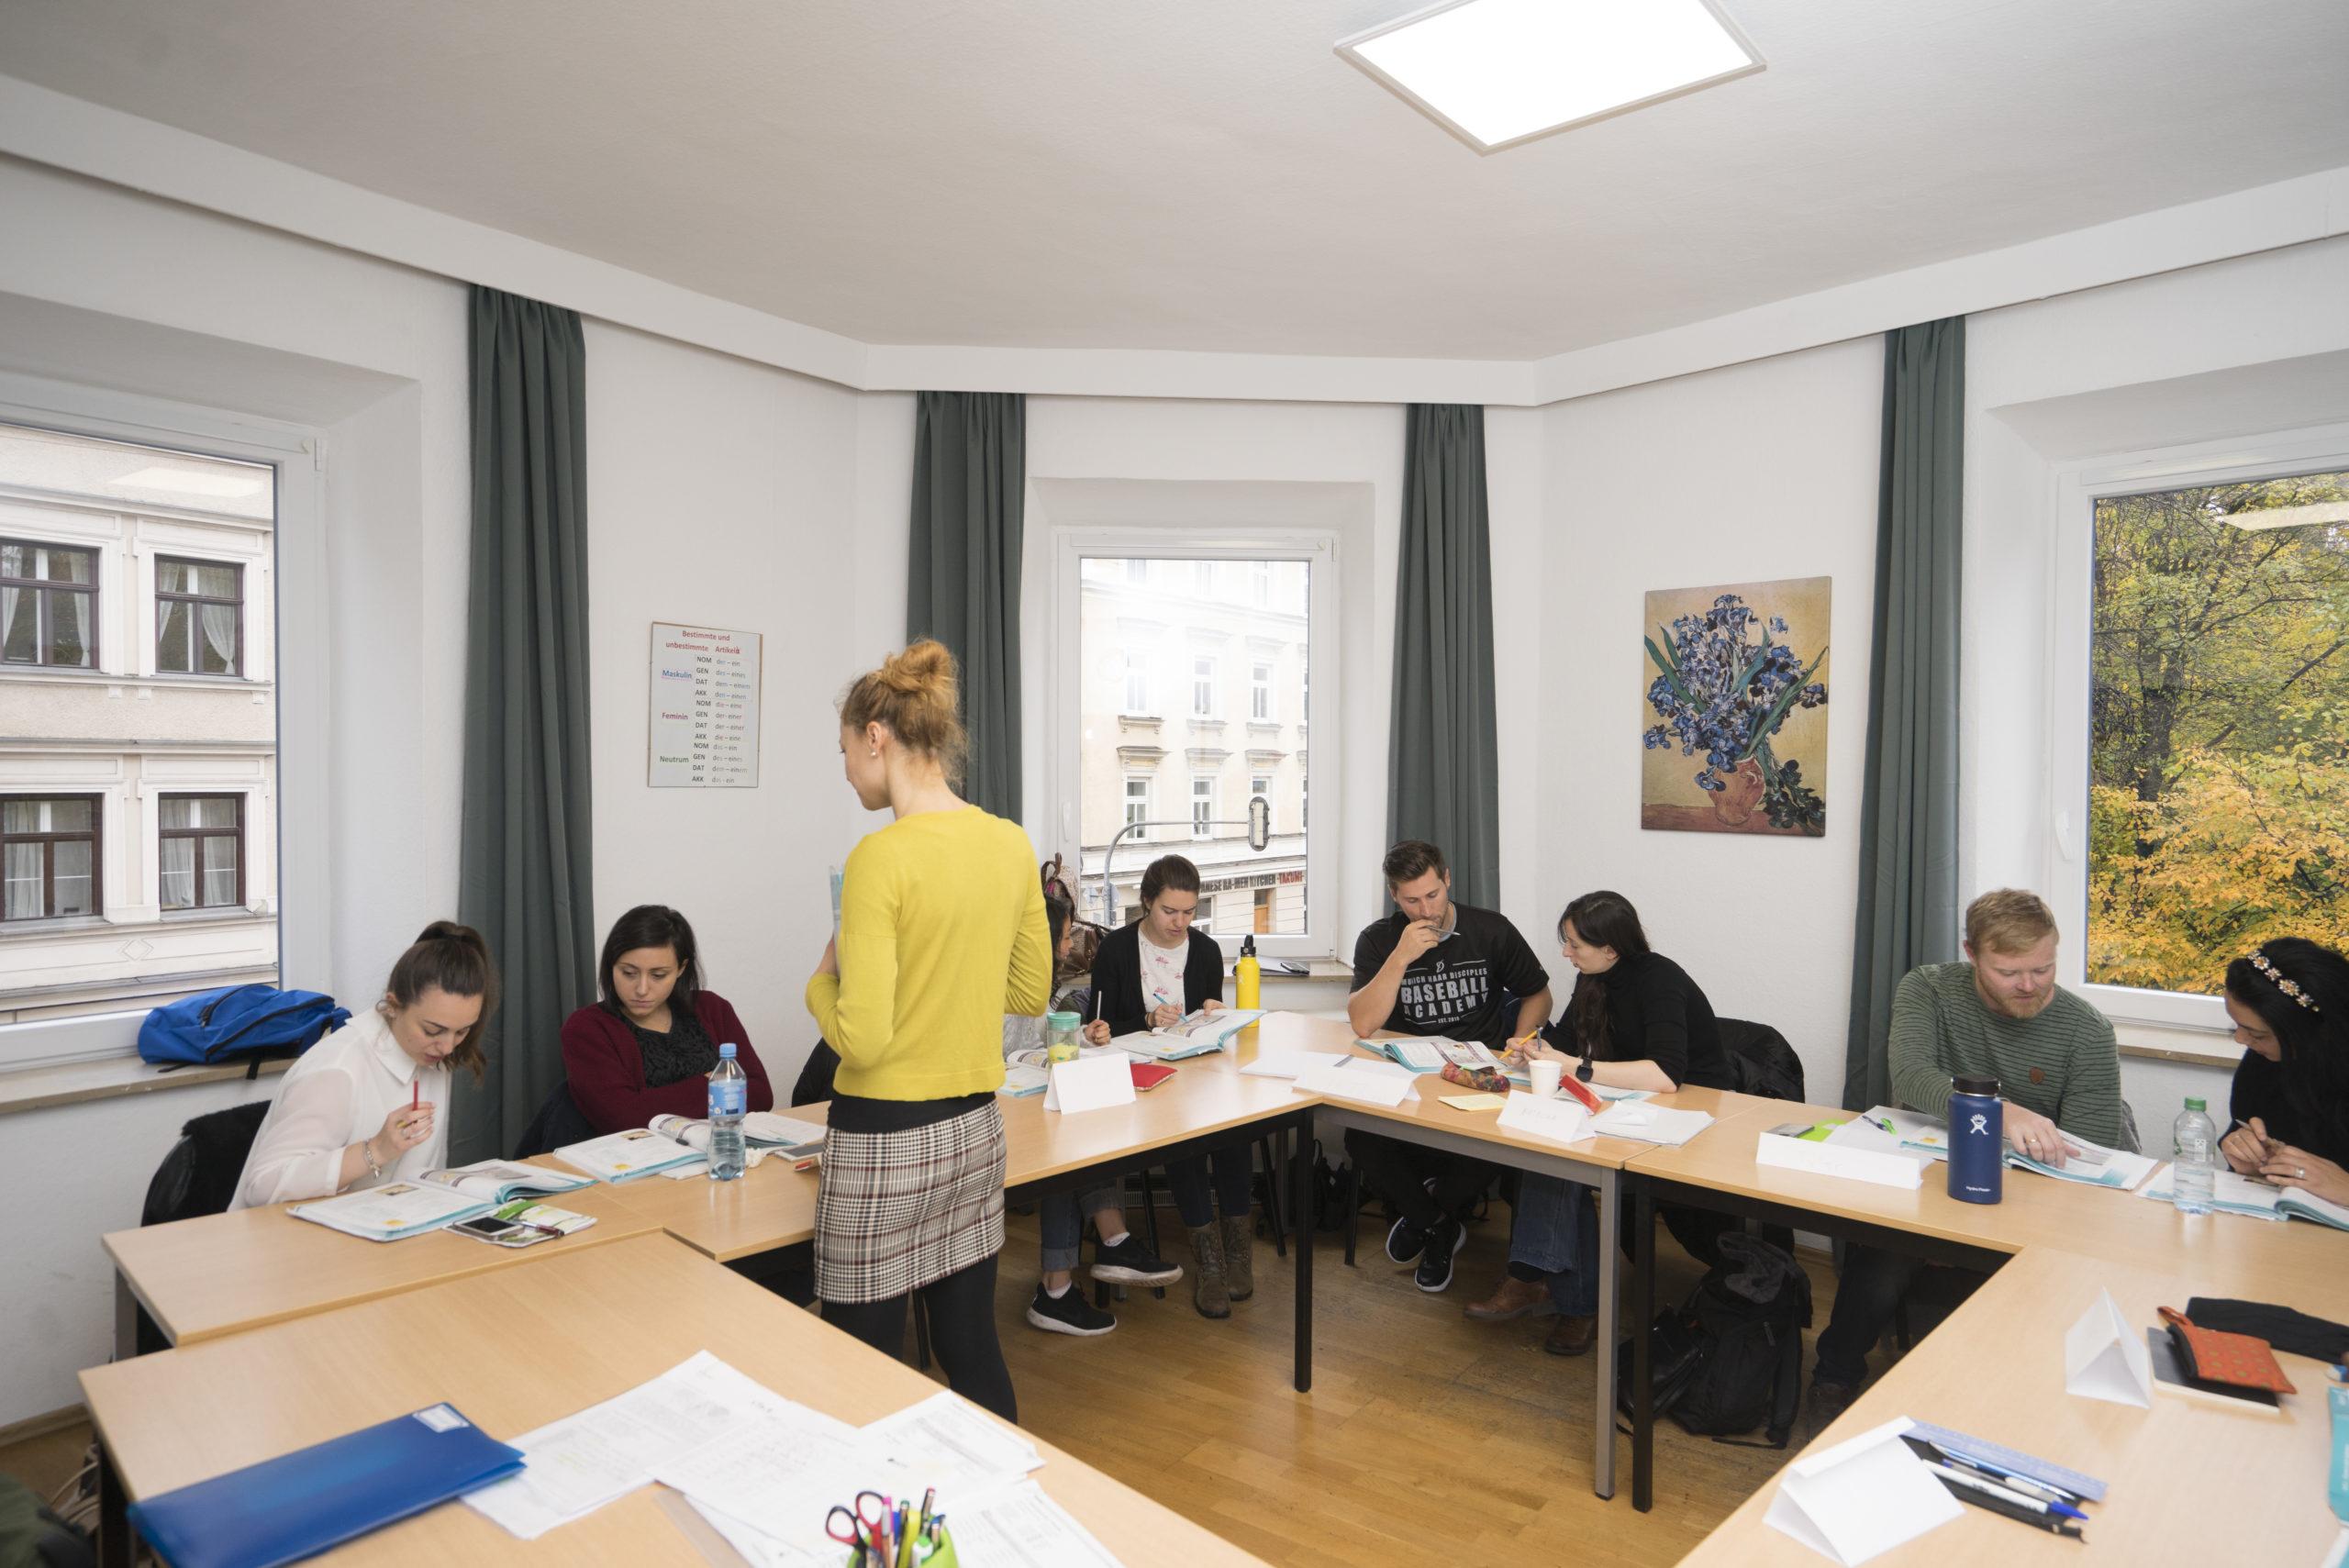 Praktikum Sprachschule Augsburg